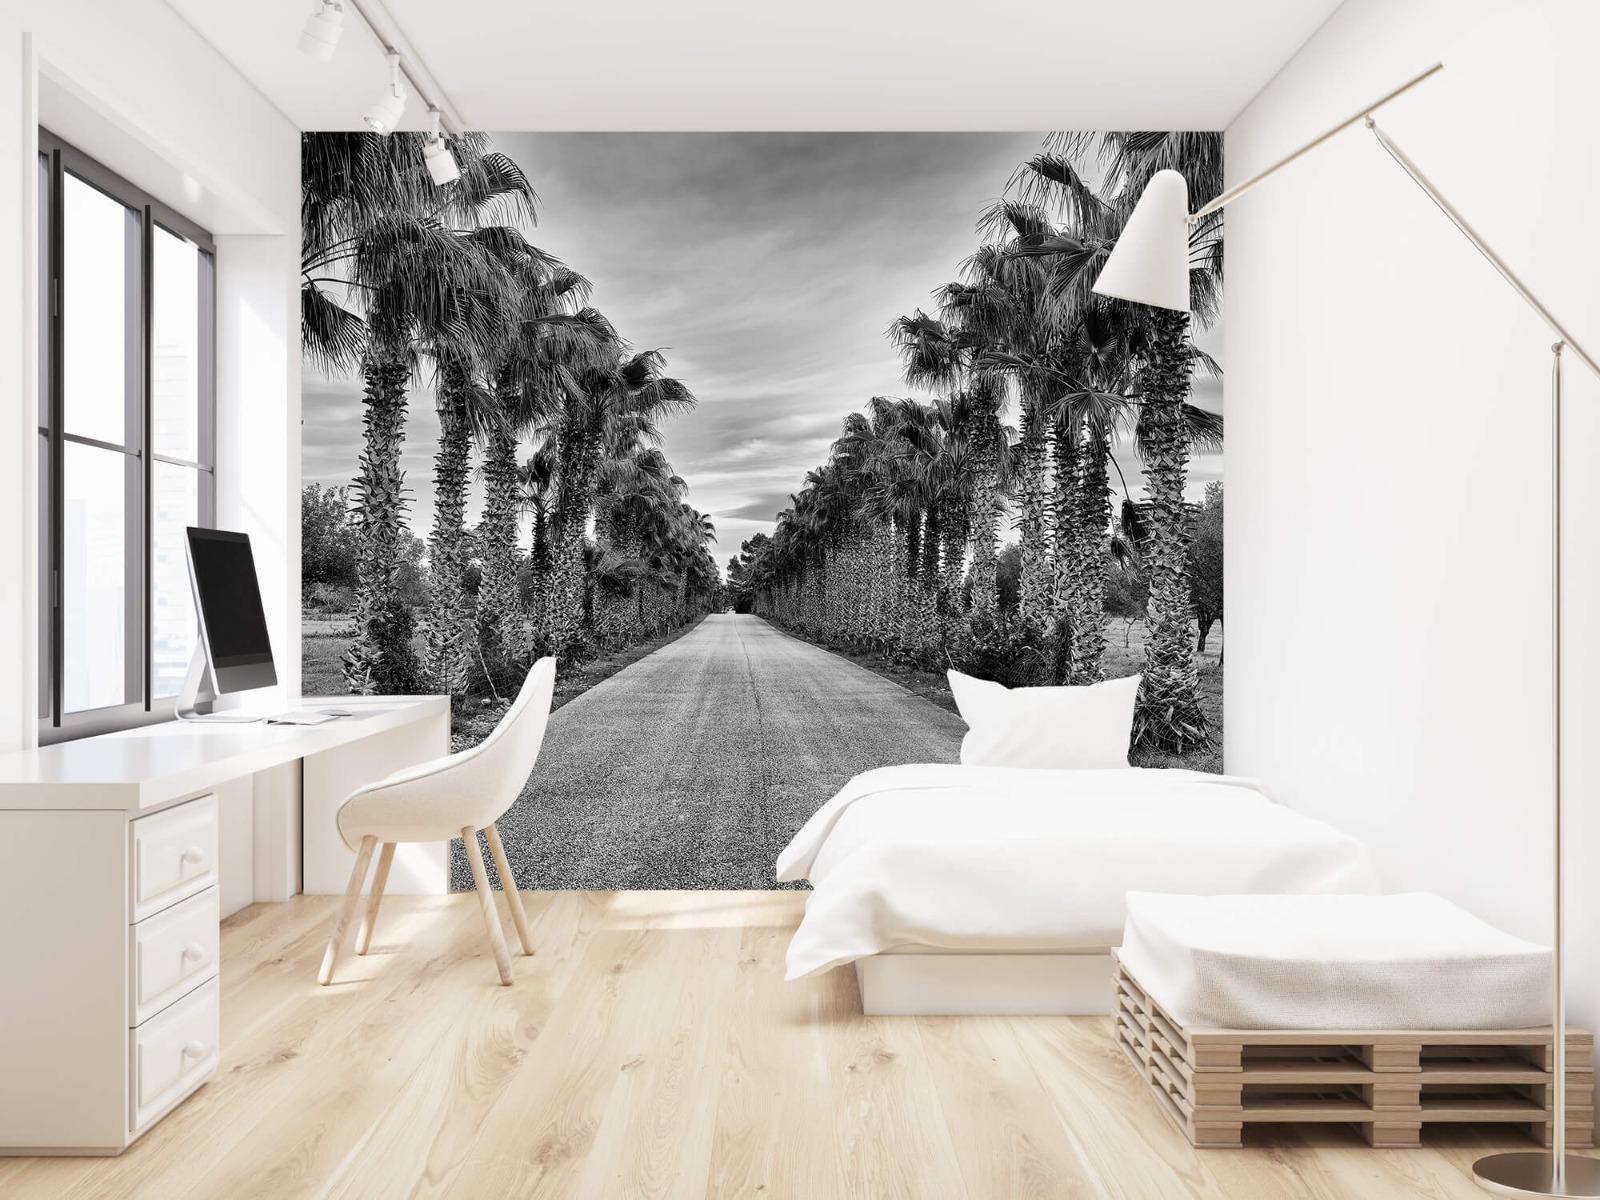 Palmbomen - Straat met palmbomen - Woonkamer 22